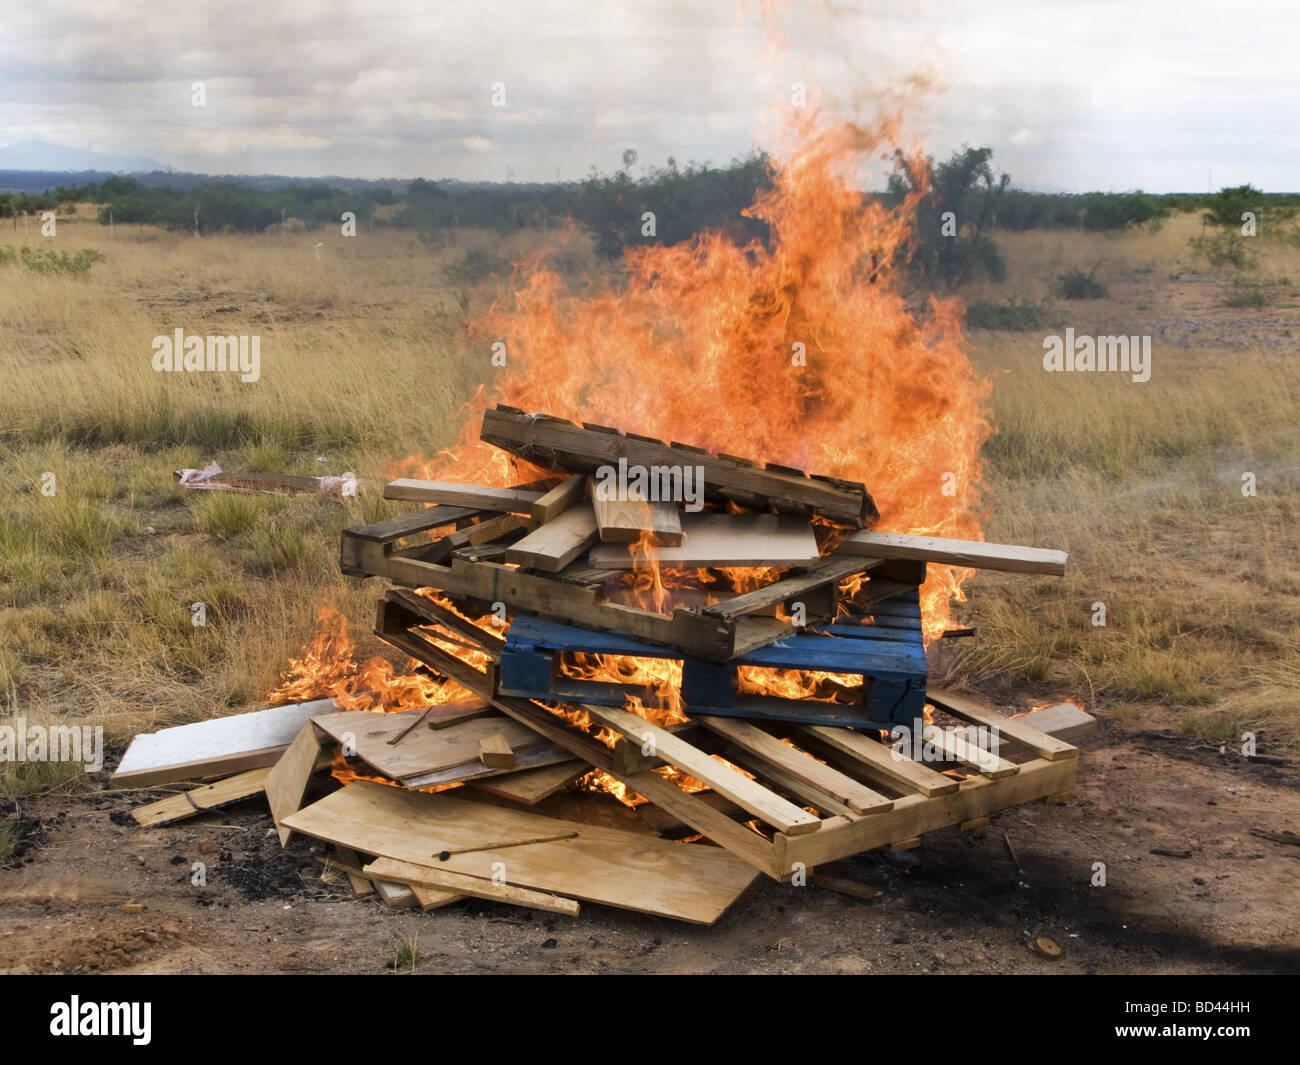 Burning wooden pallets Stock Photo: 25292333 - Alamy